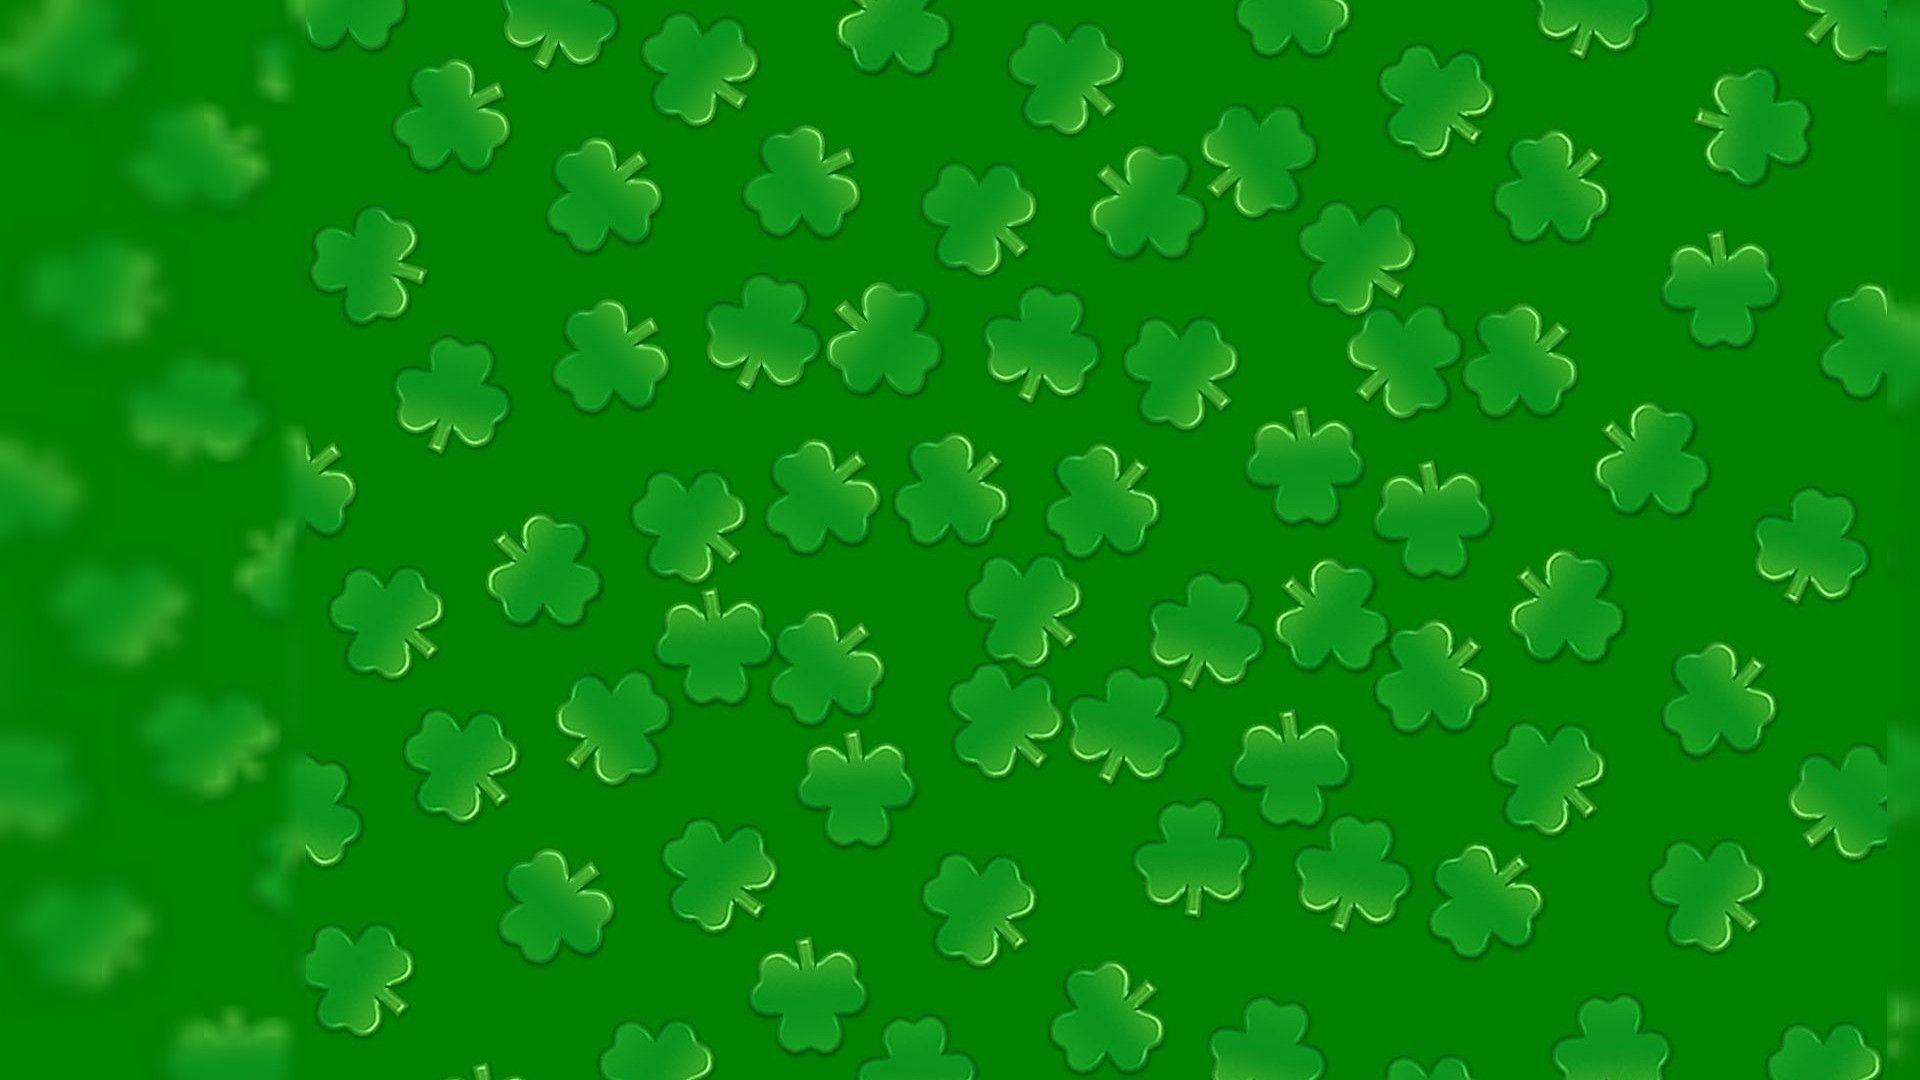 Saint Patricks Day Wallpapers   Top Saint Patricks Day 1920x1080